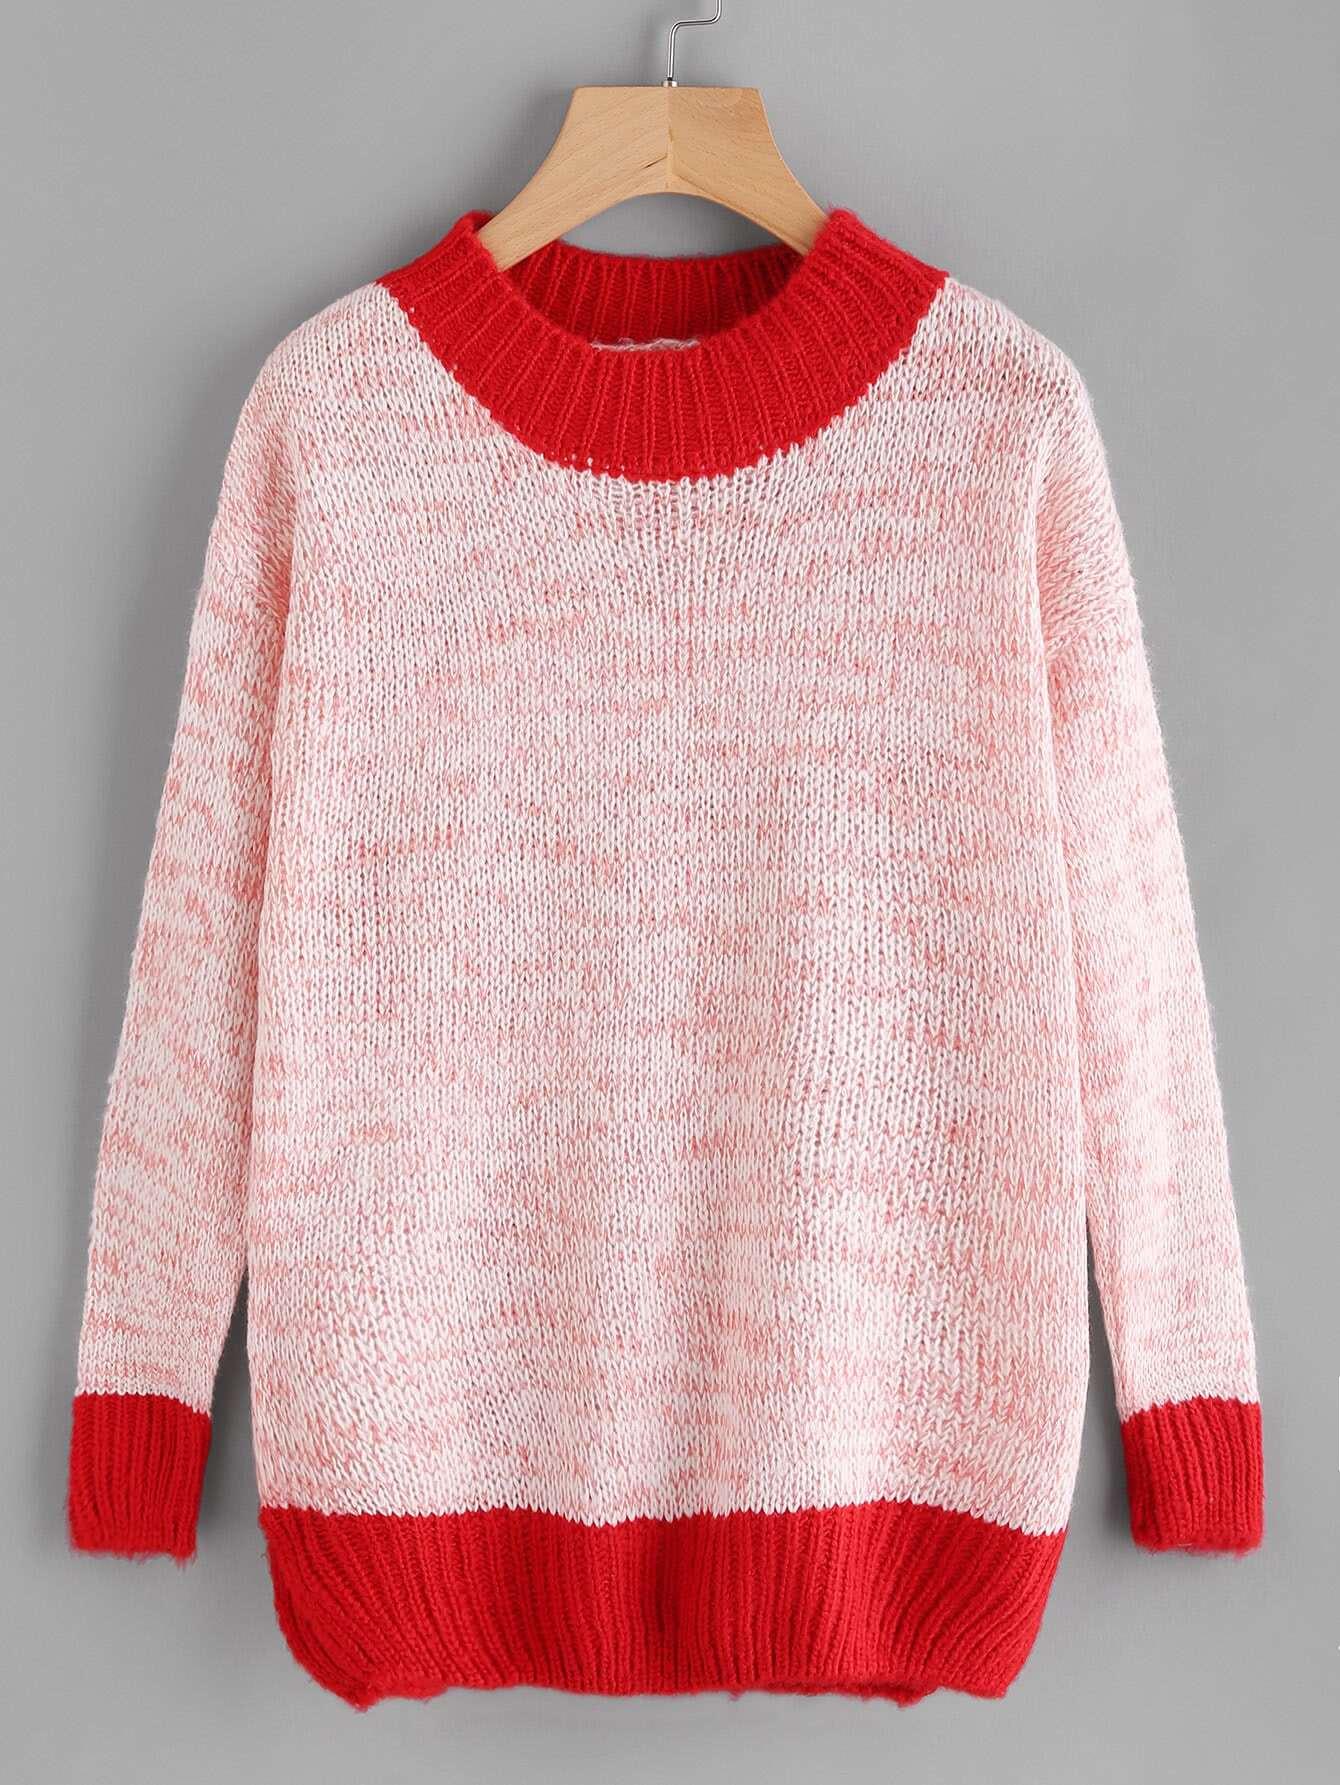 Contrast Trim Knit Sweater sweater170913111